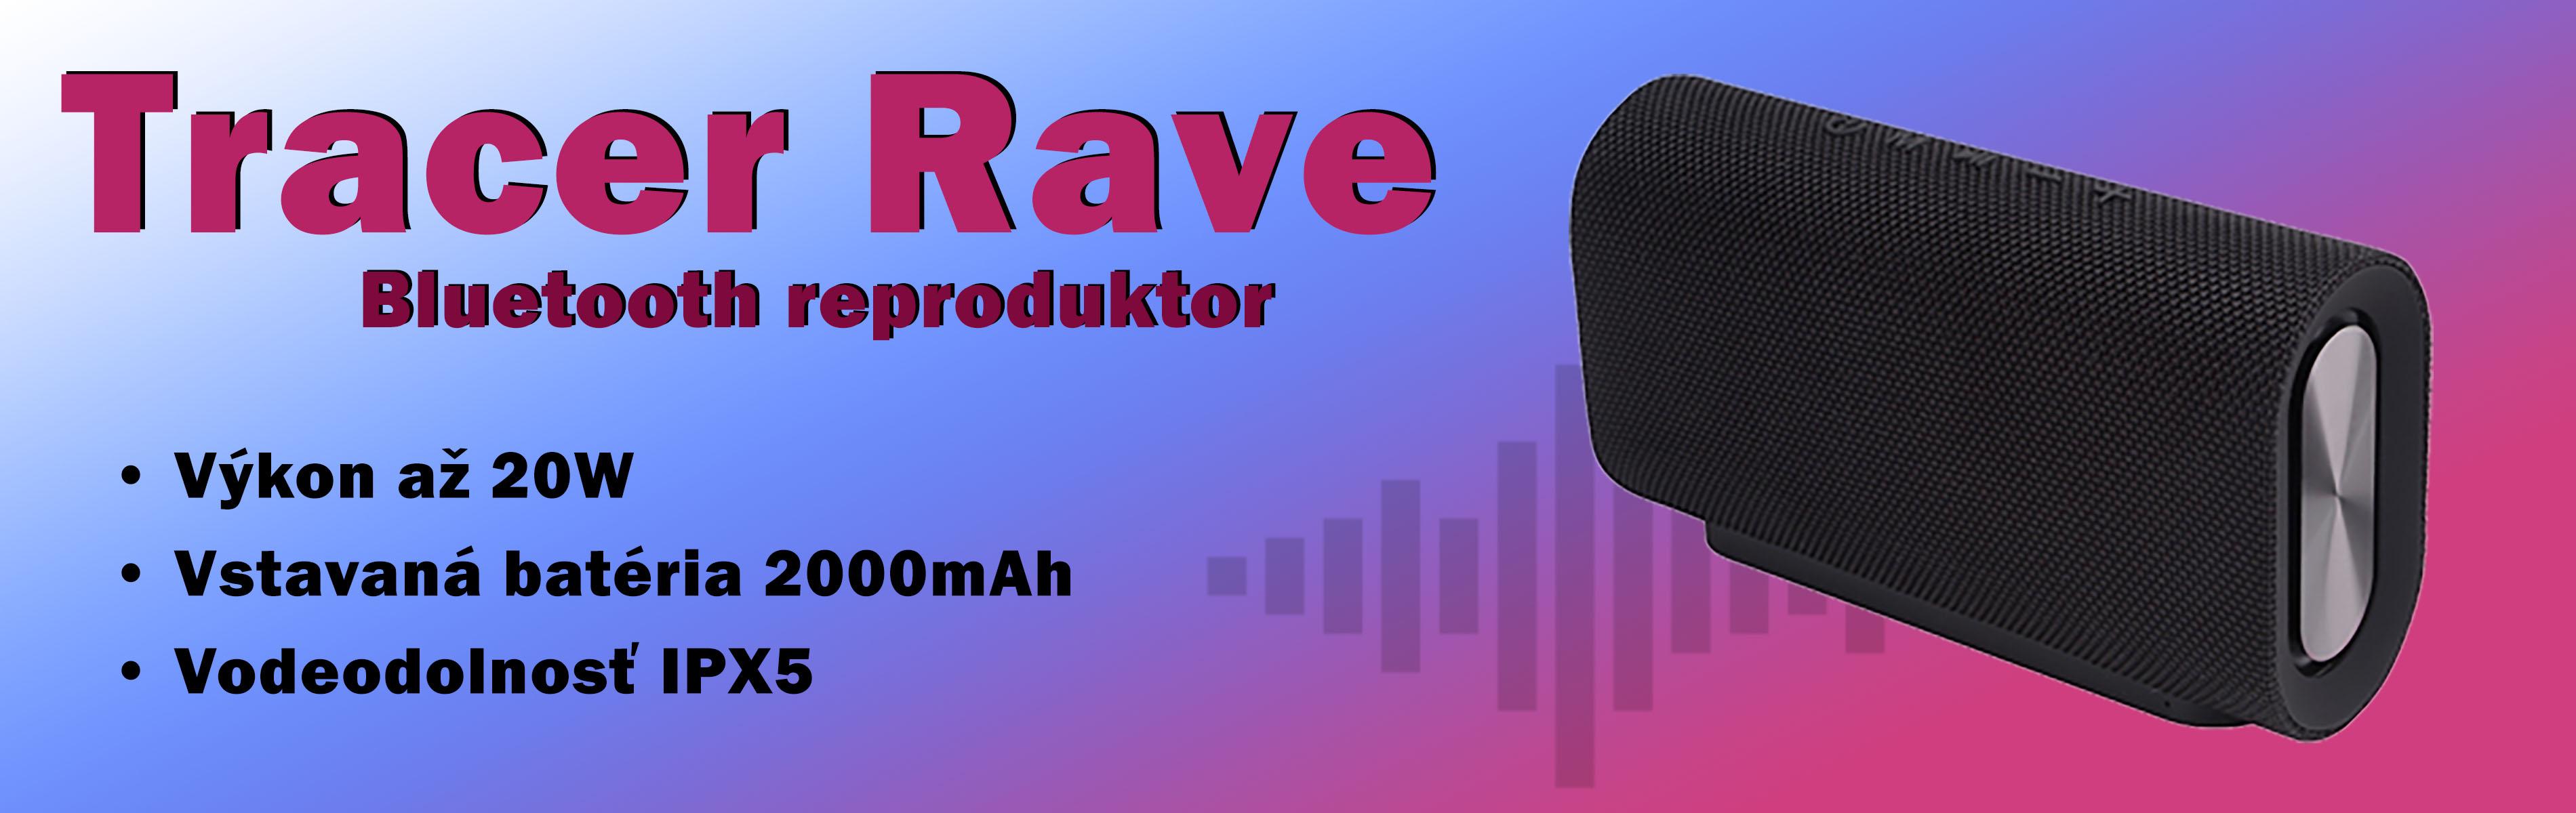 Tracer Rave